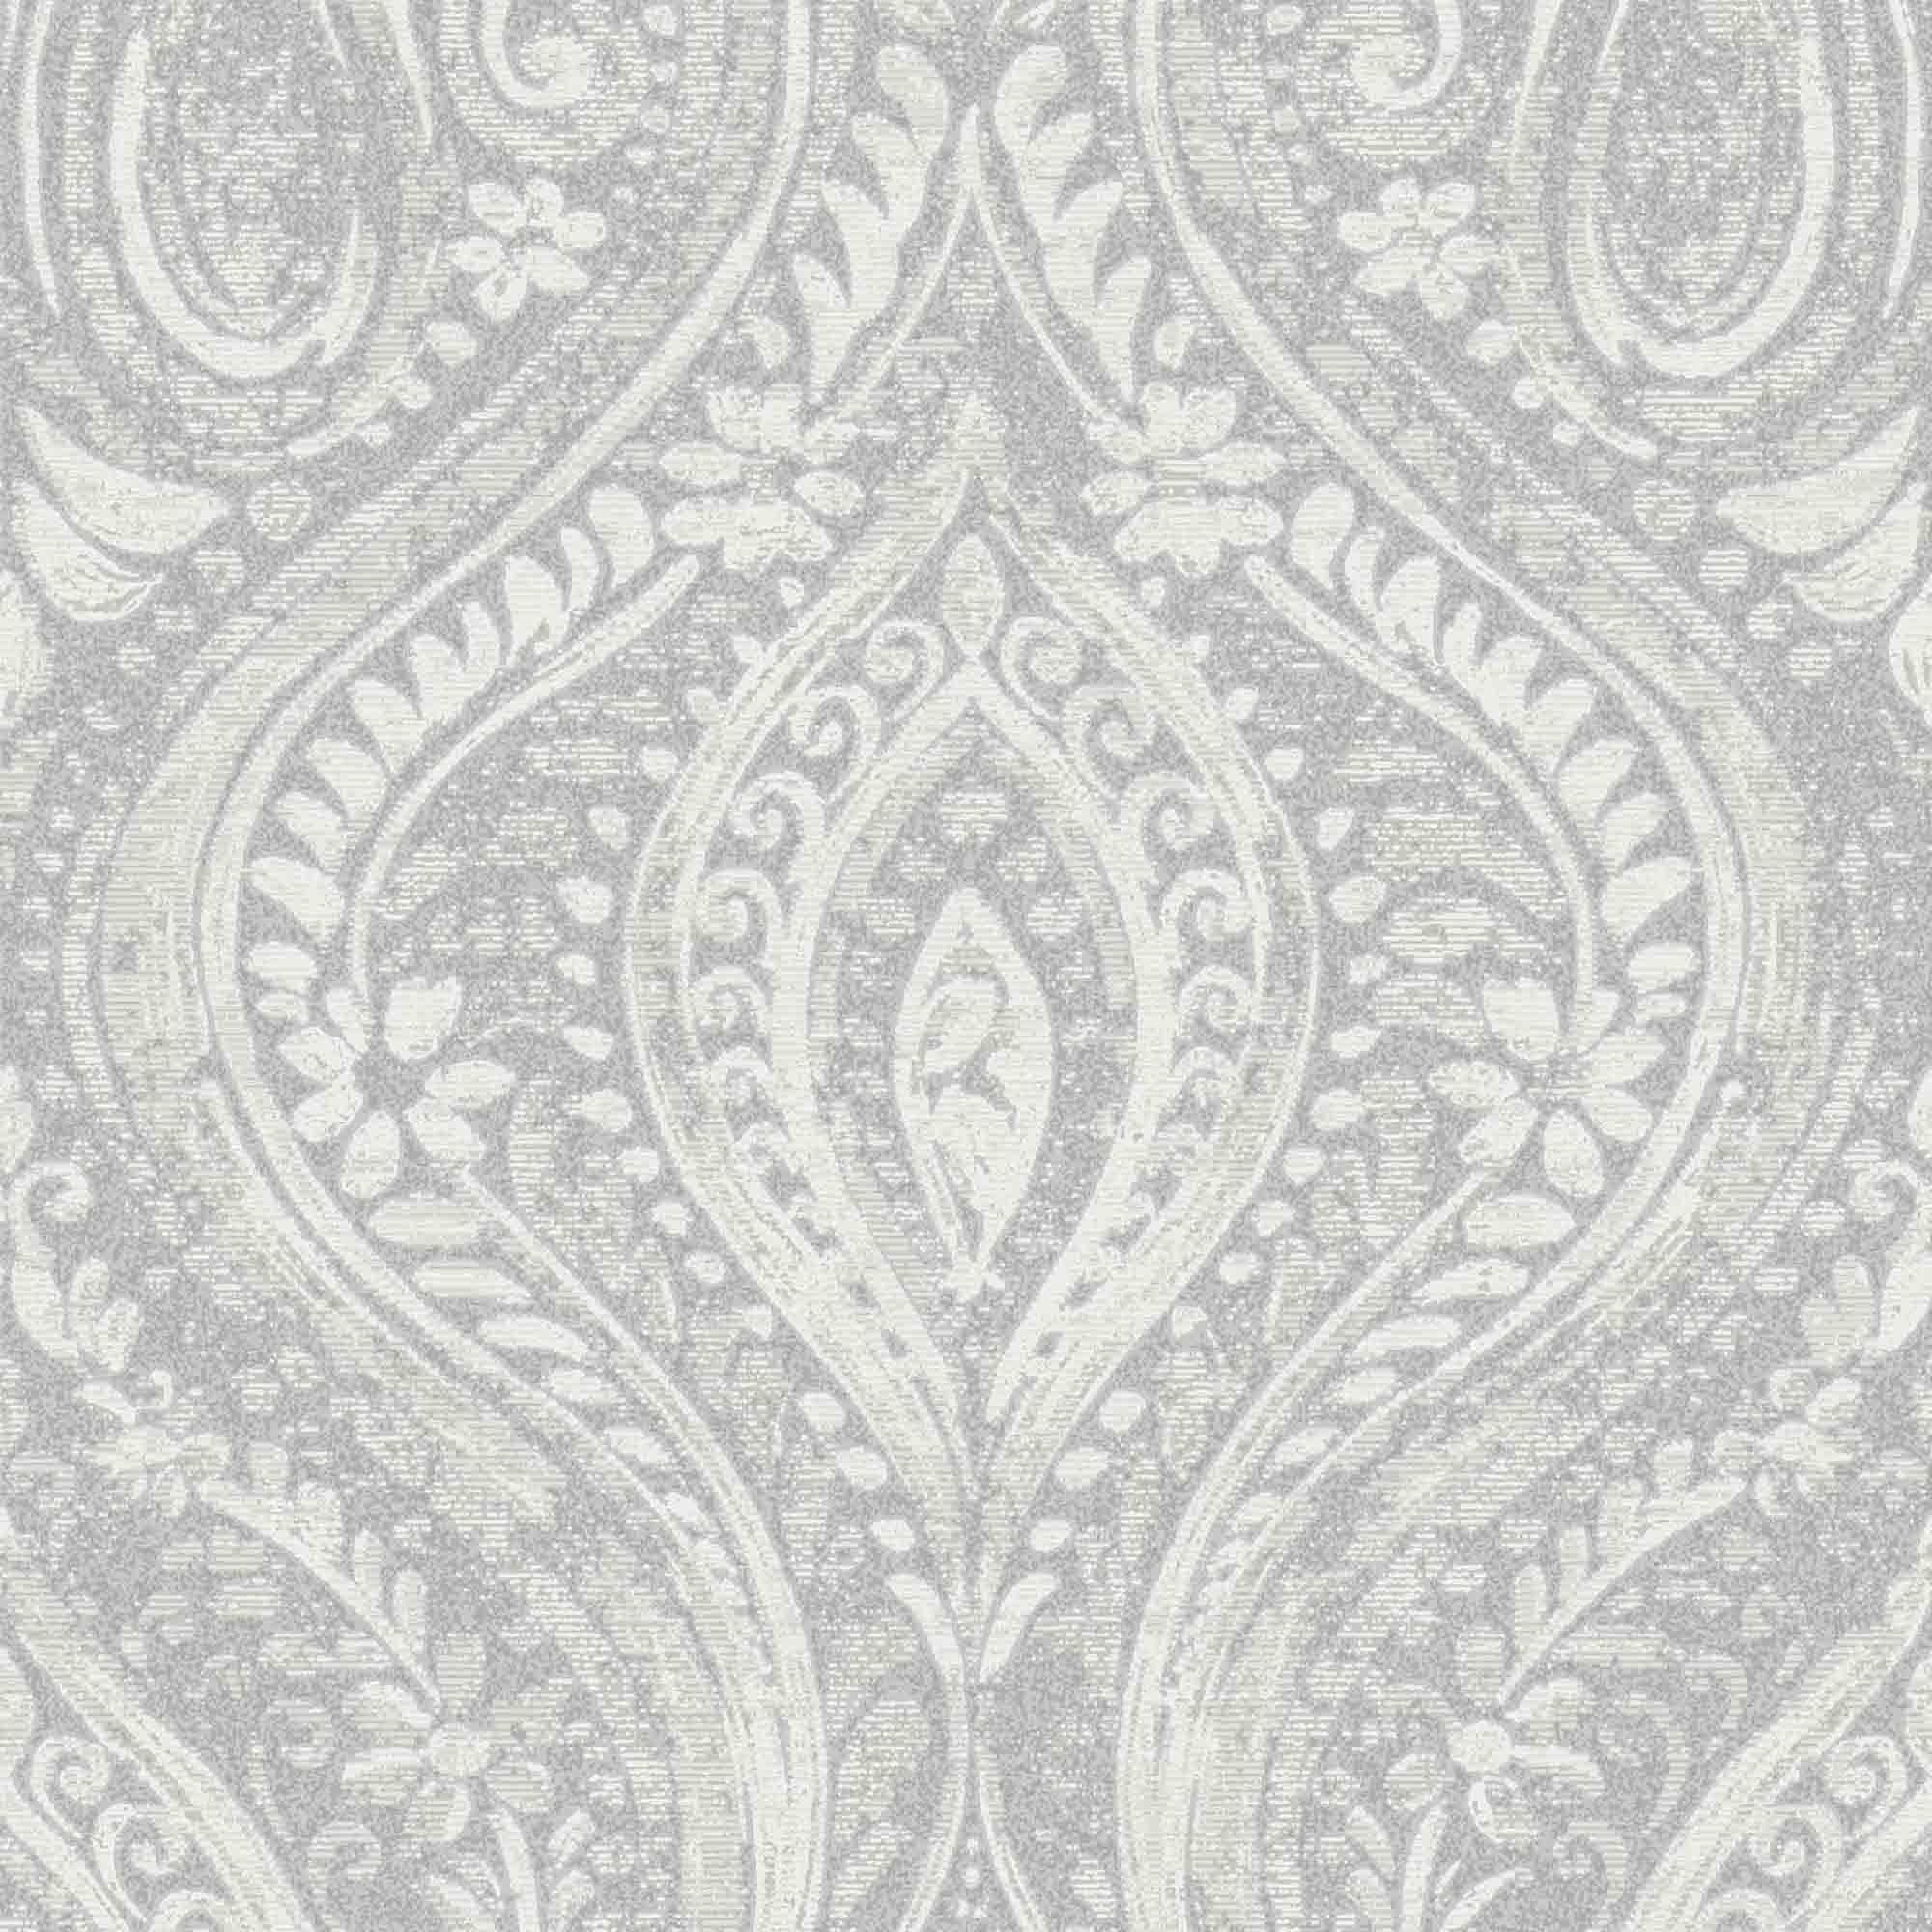 Gold Anoushka Grey Damask Sheen Wallpaper Departments